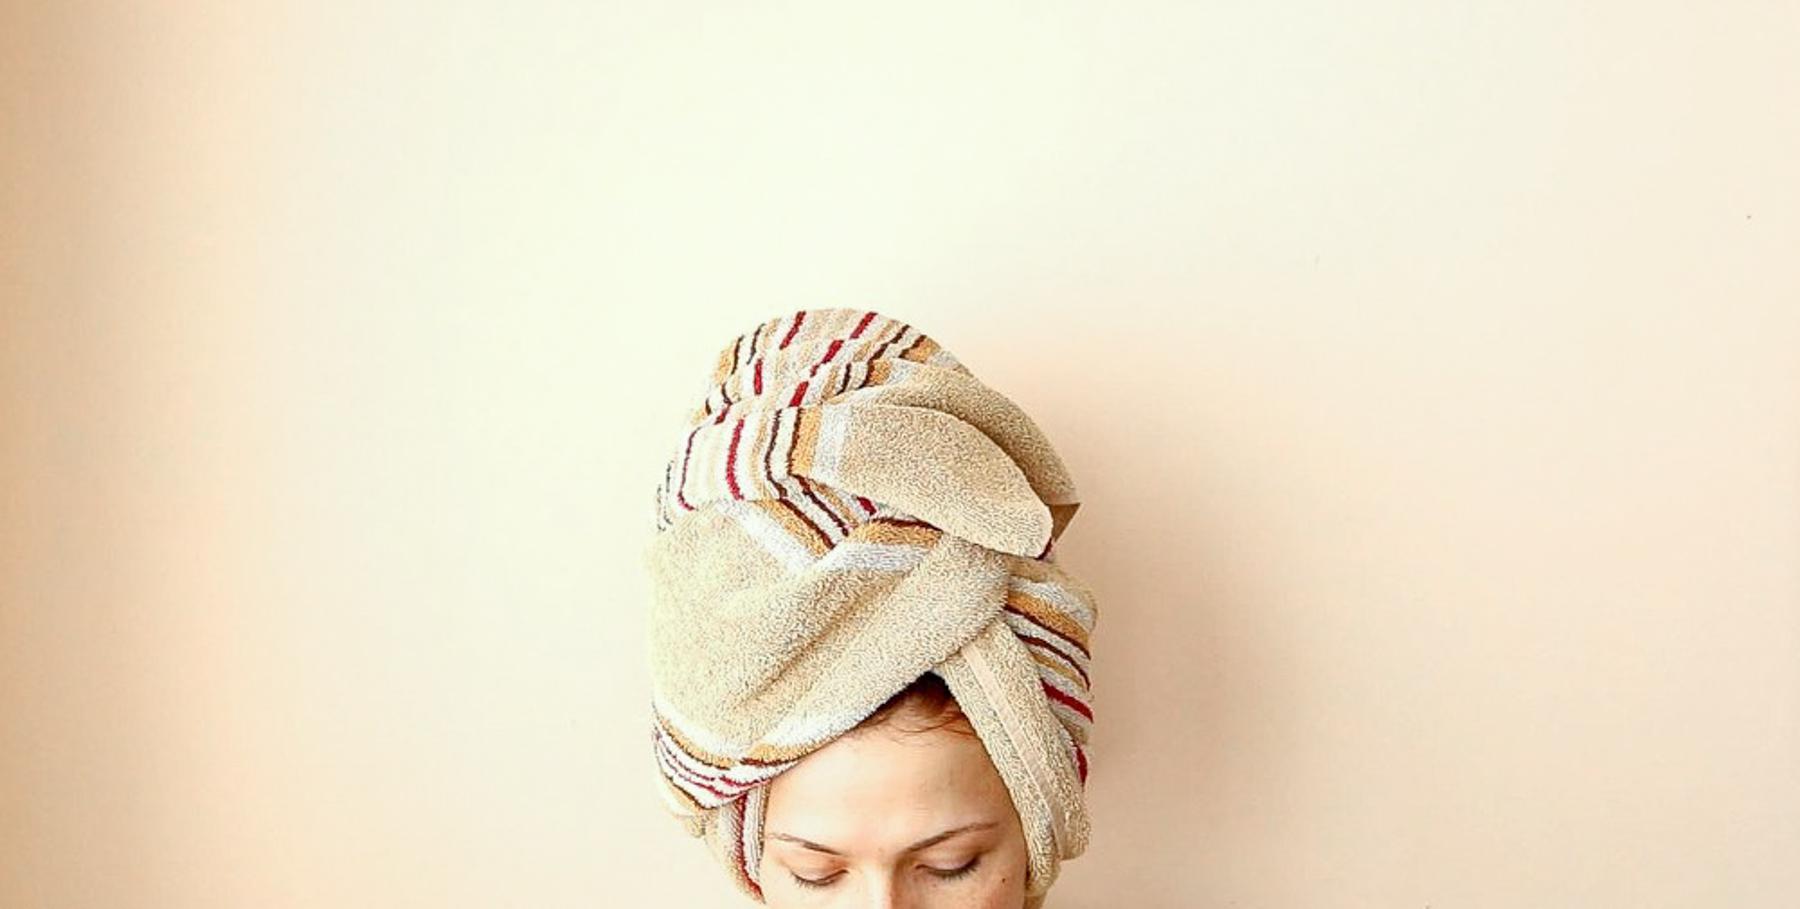 towel on head with olaplex mask